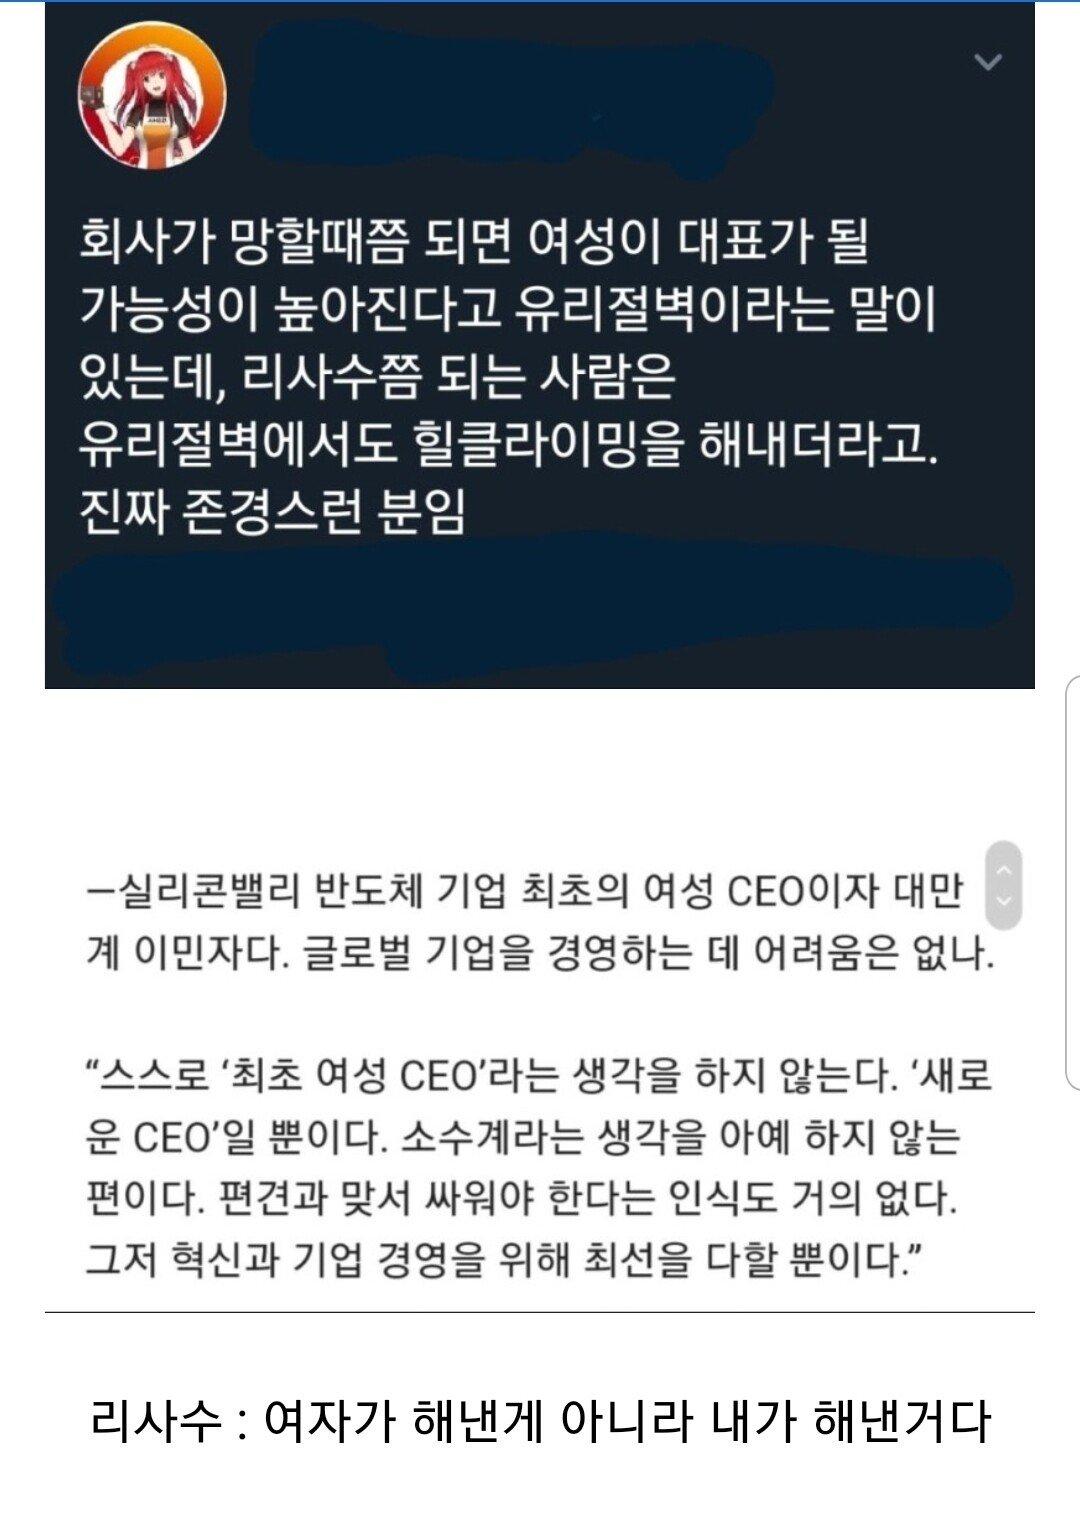 Screenshot_20190619-164340_Samsung Internet.jpg 리사수 : 나는 최초의 여성 CEO가 아니다.